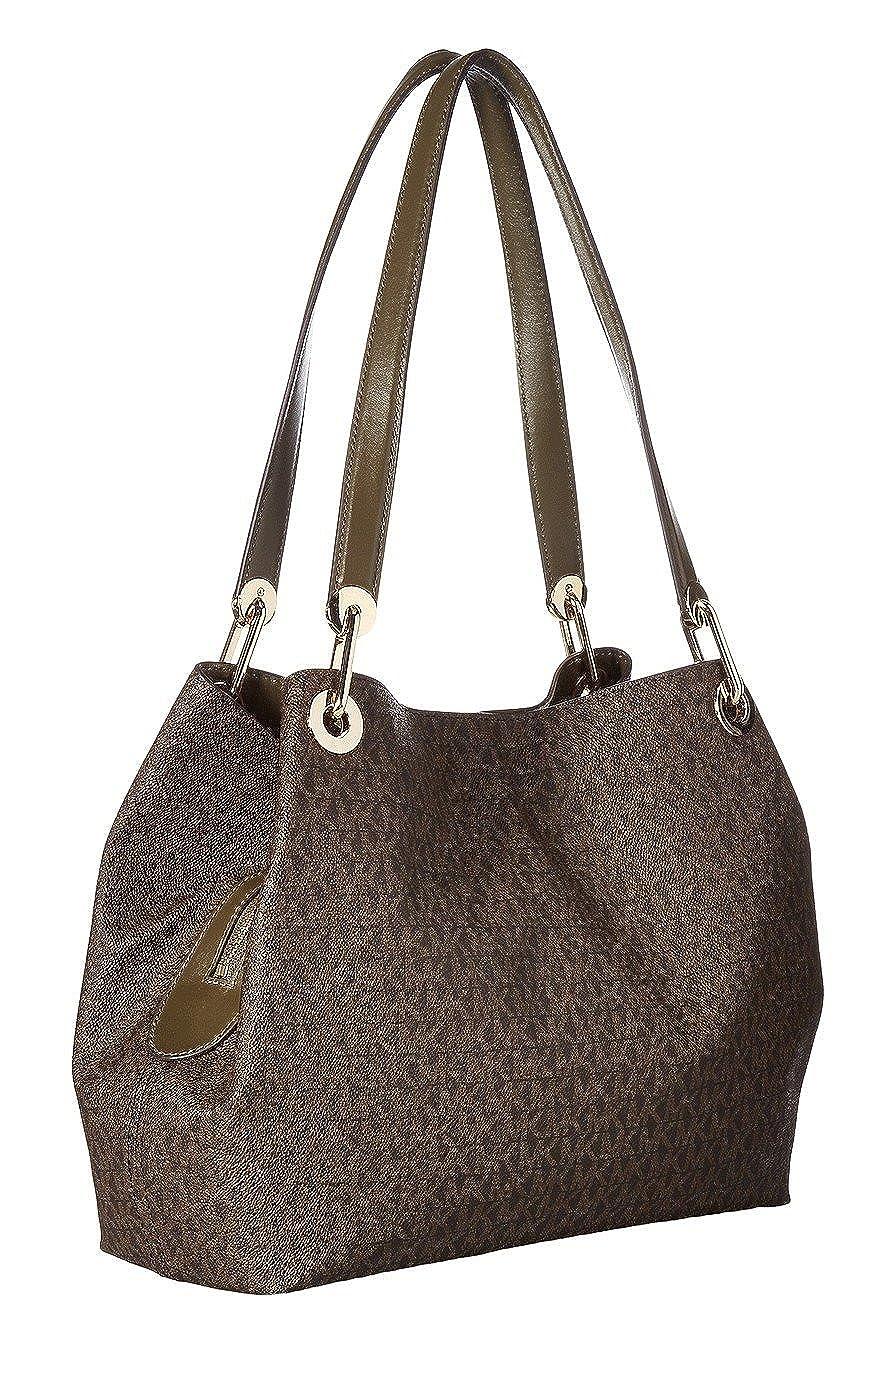 4f916619ac42 MICHAEL Michael Kors Raven Large Shoulder Tote Olive/Brown: Handbags:  Amazon.com